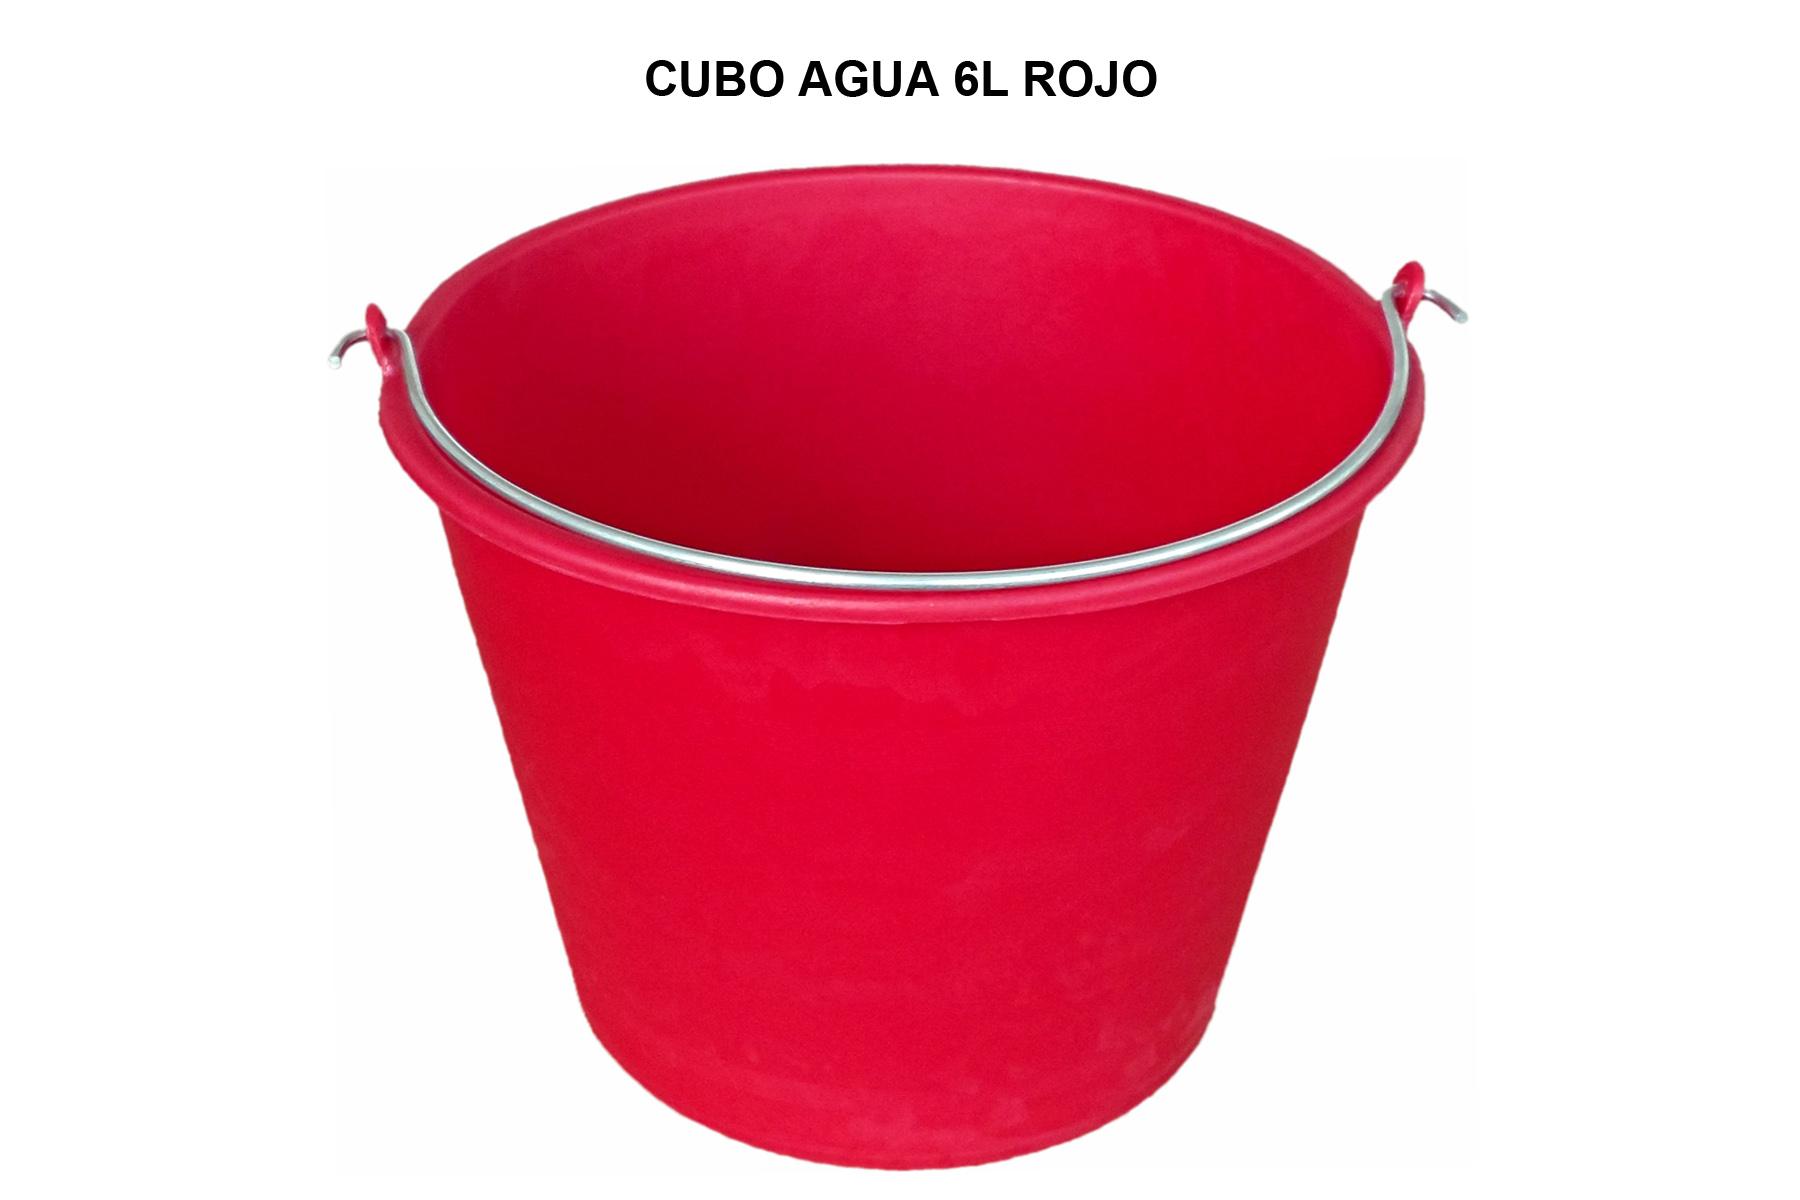 CUBO 6L ROJO